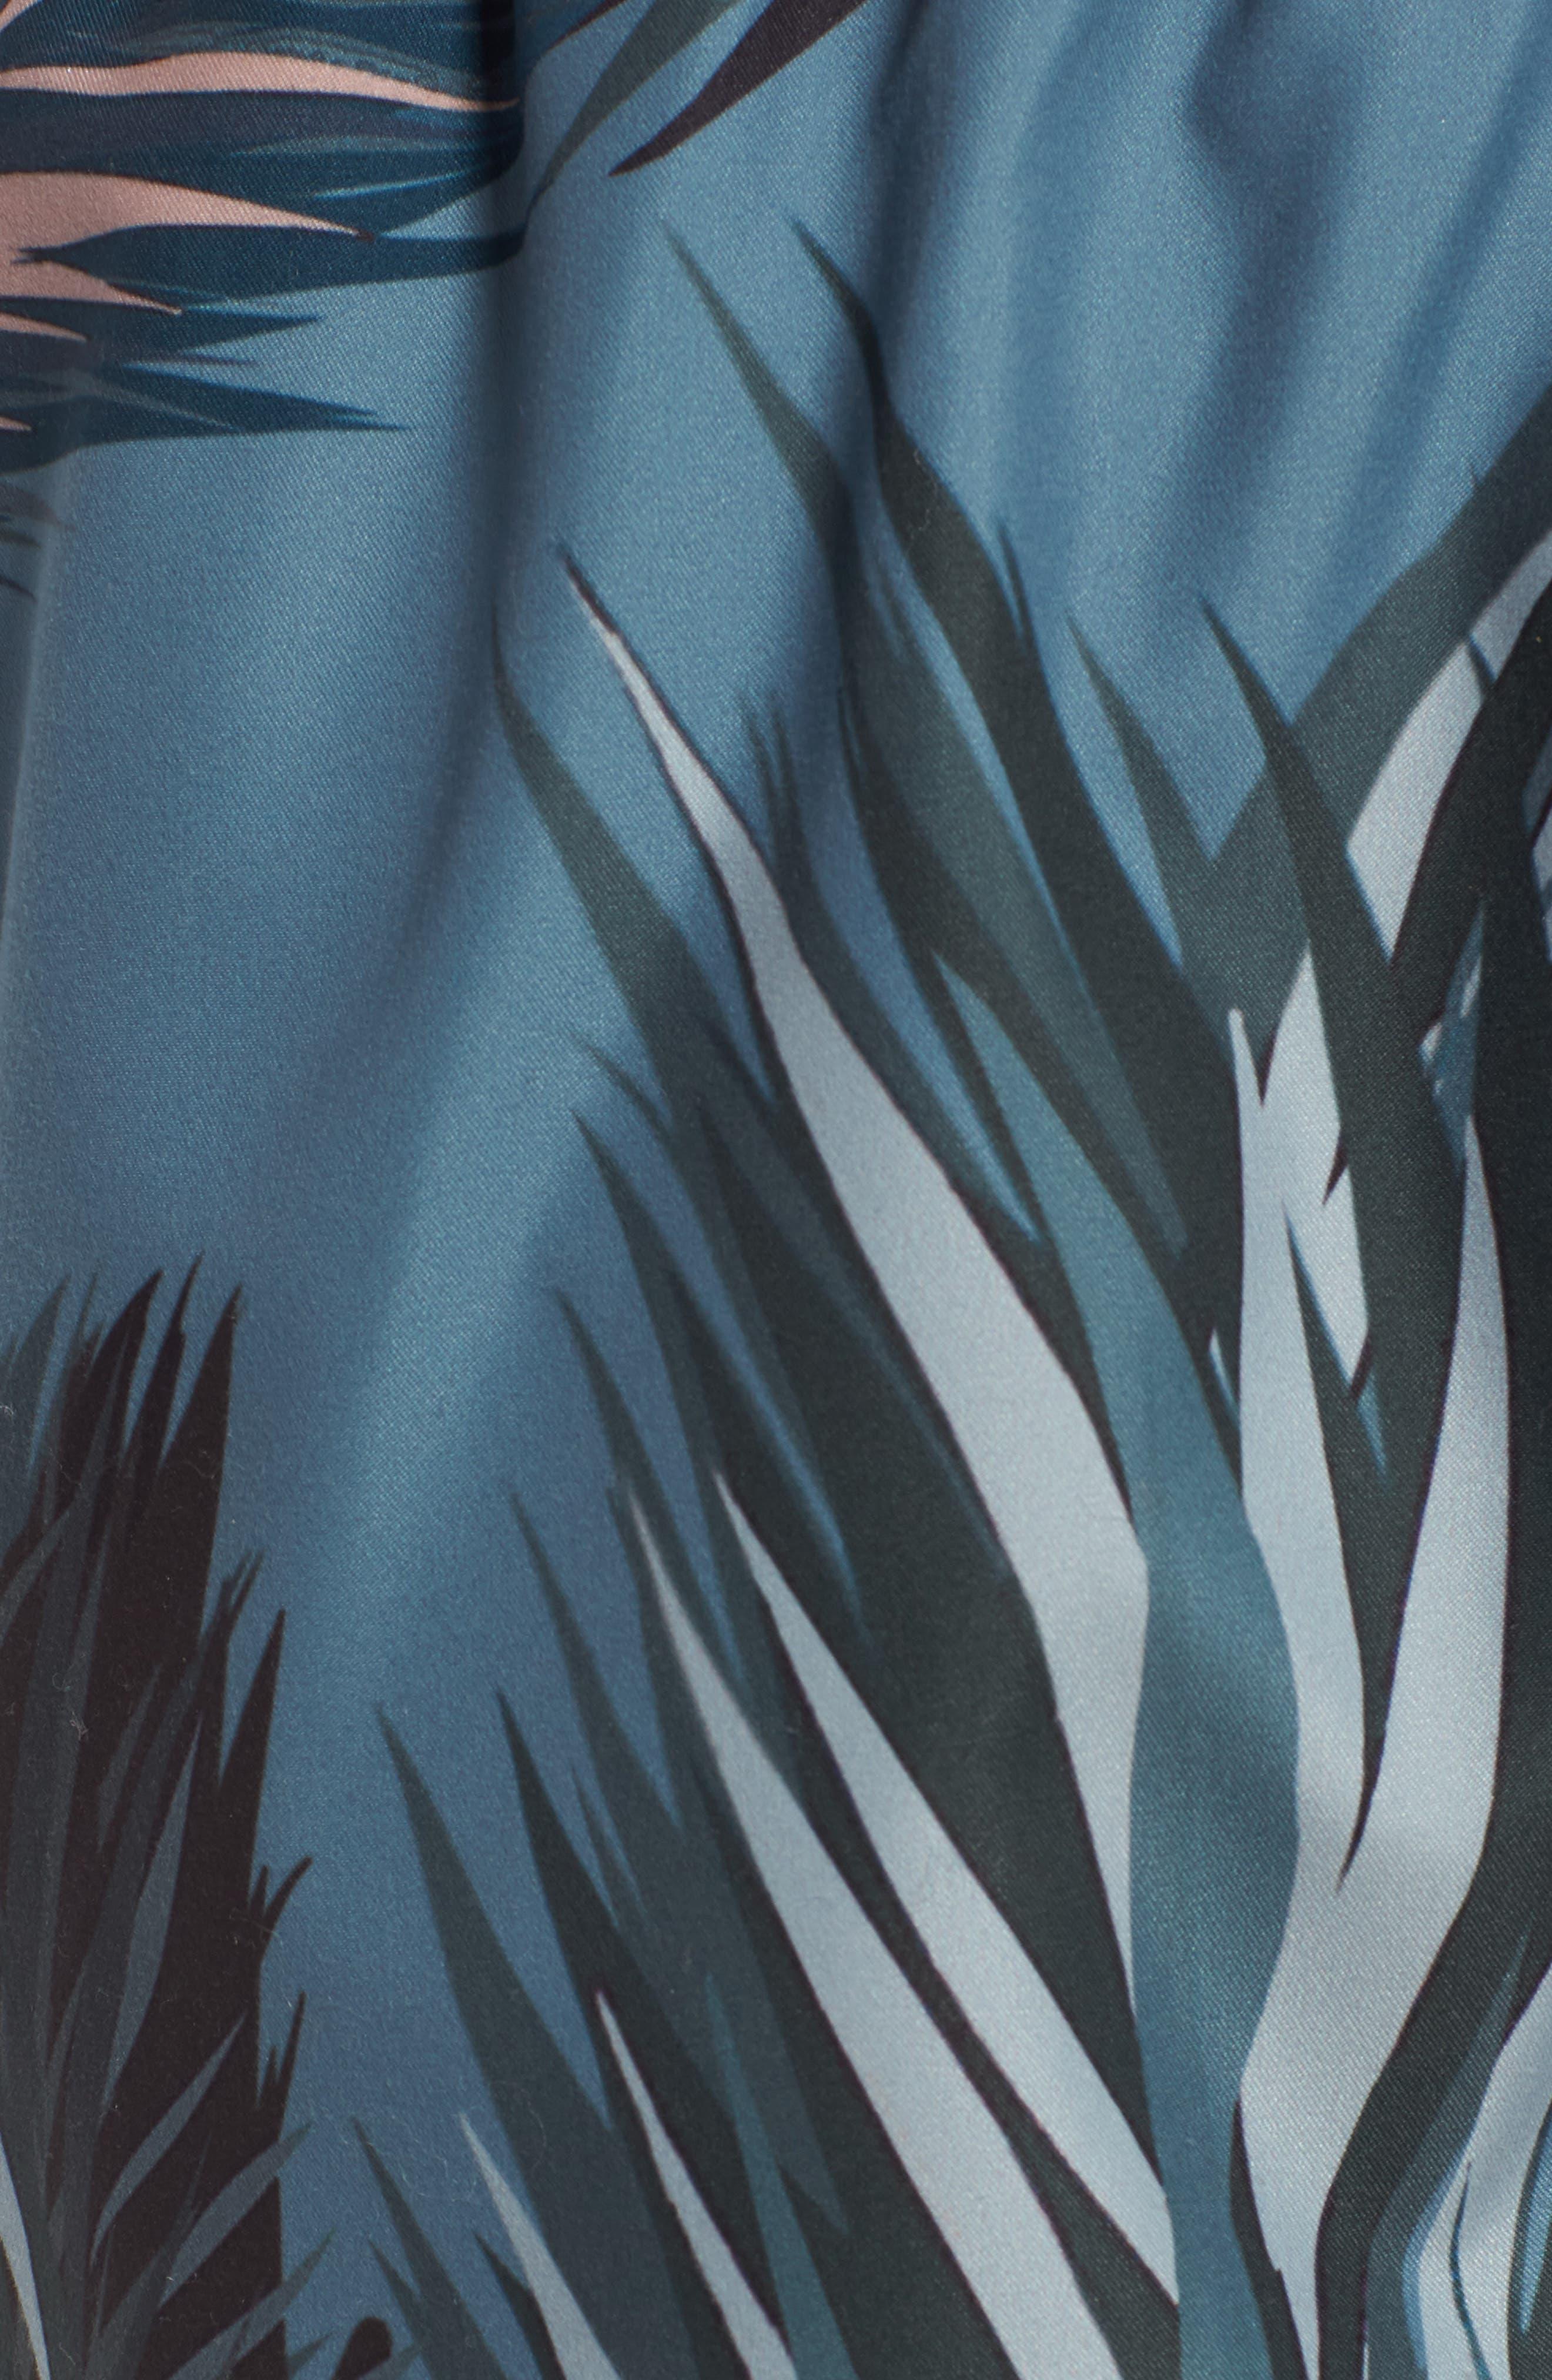 Raynebo Slim Fit Palm Leaf Swim Trunks,                             Alternate thumbnail 5, color,                             Dark Green